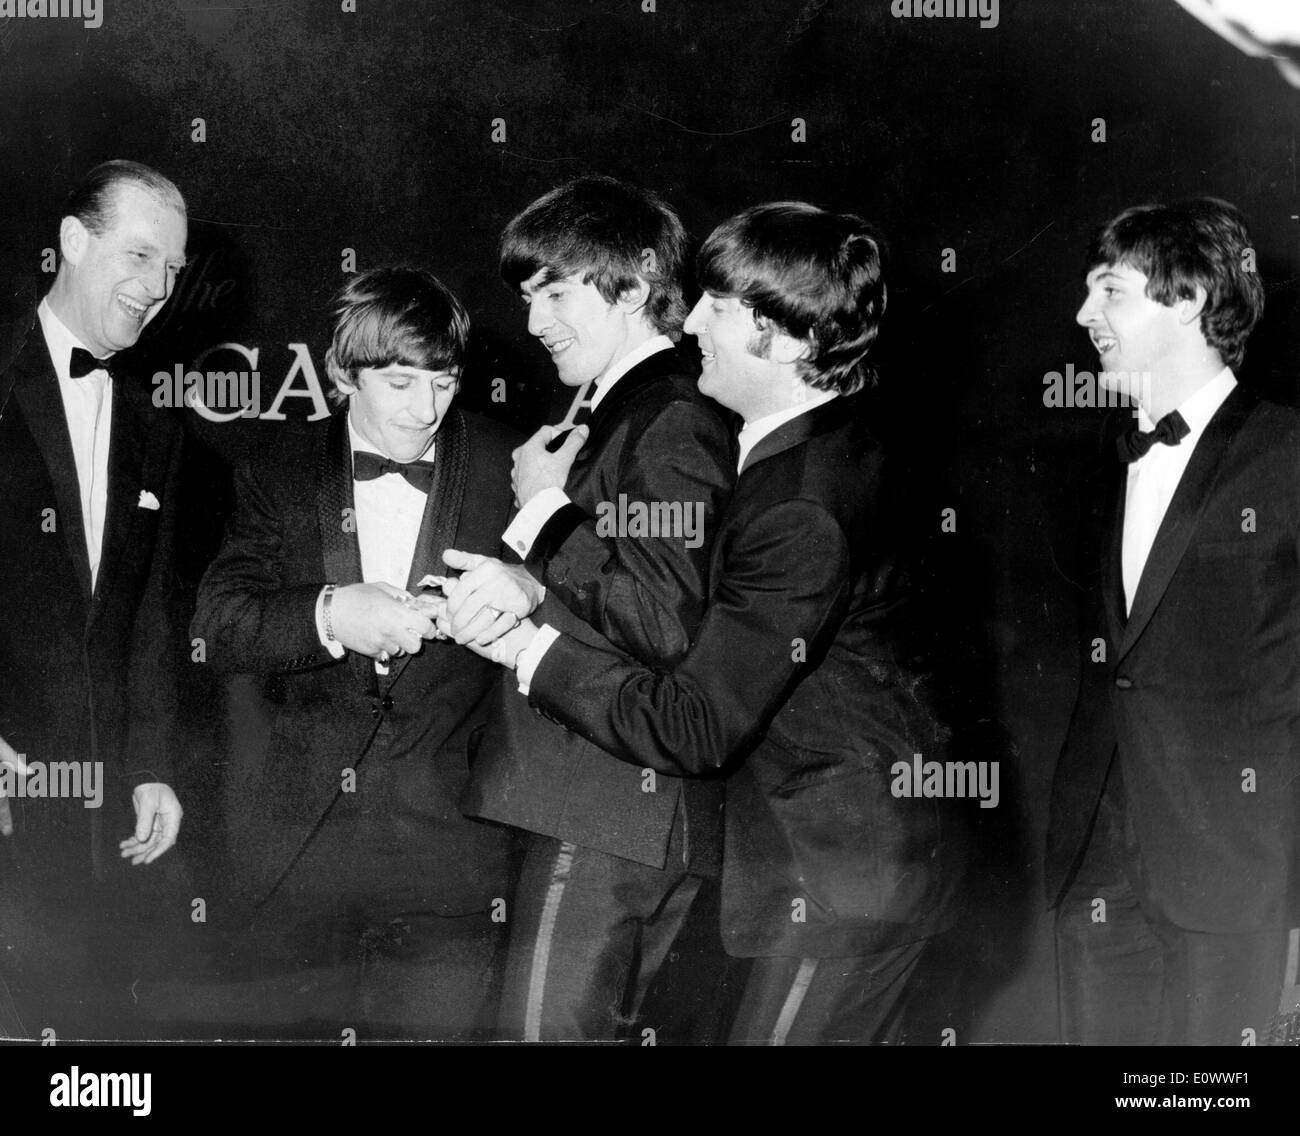 The Beatles jokingly fight over their Carl-Alan Award - Stock Image